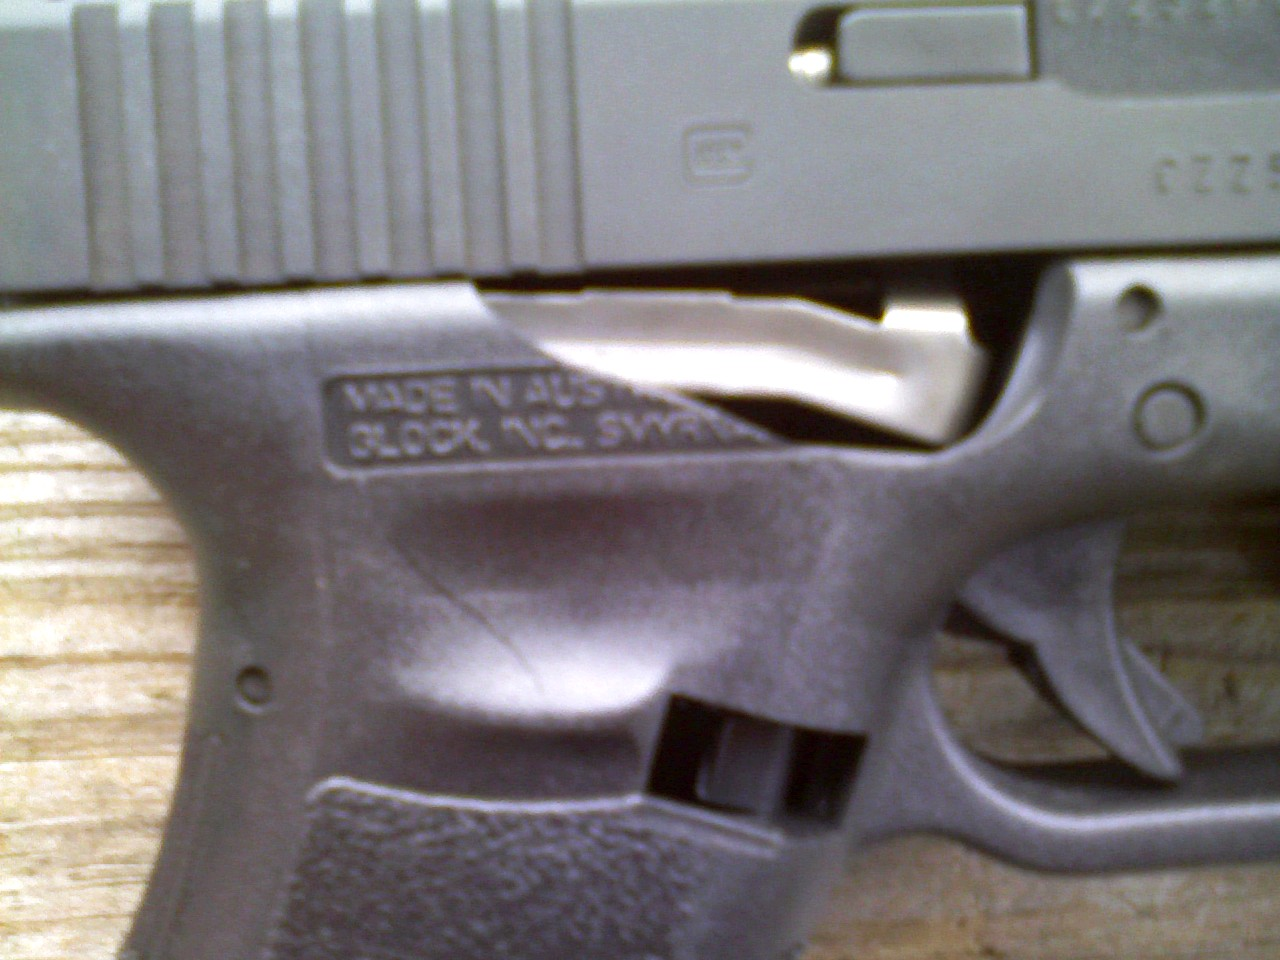 Glock 22 Kb at the range today-pic-0017.jpg